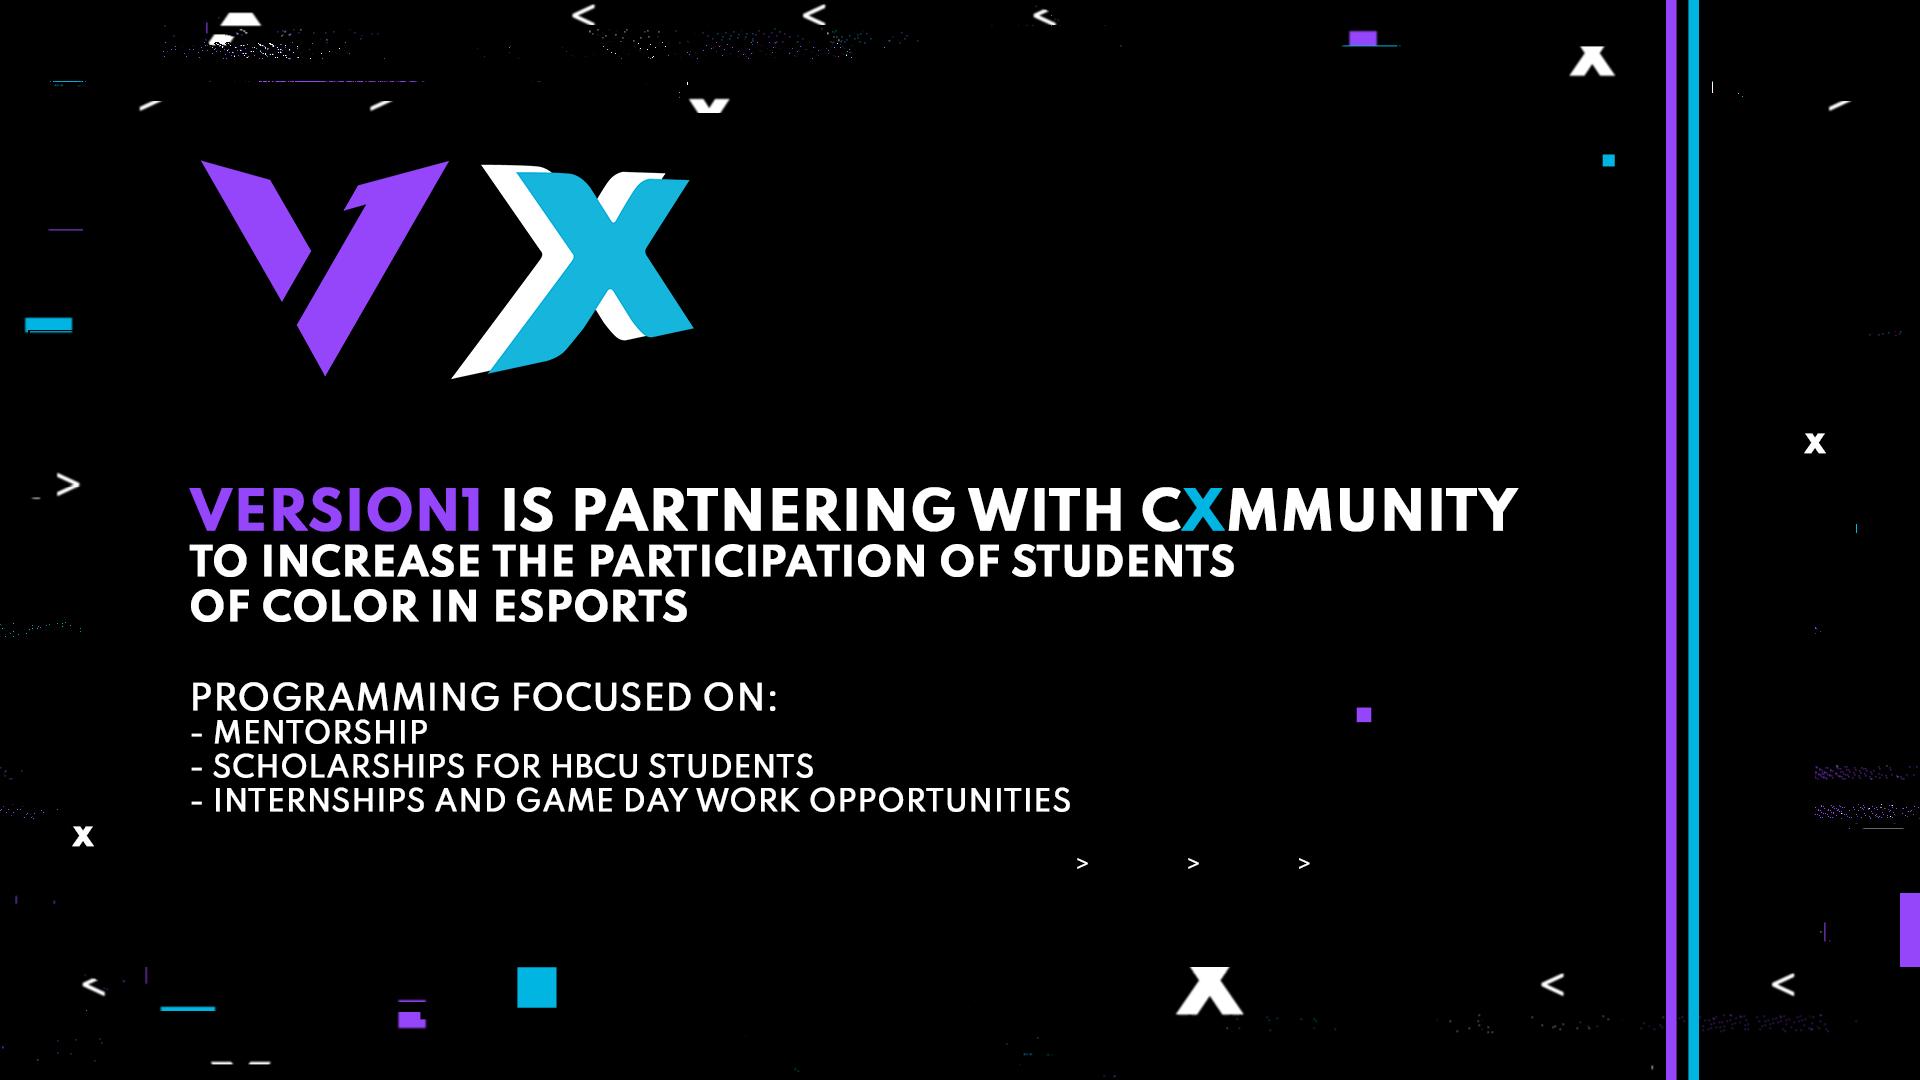 Cxmmunity and Version1 launch esports scholarship, mentorship programmes for HBCU students – Esports Insider